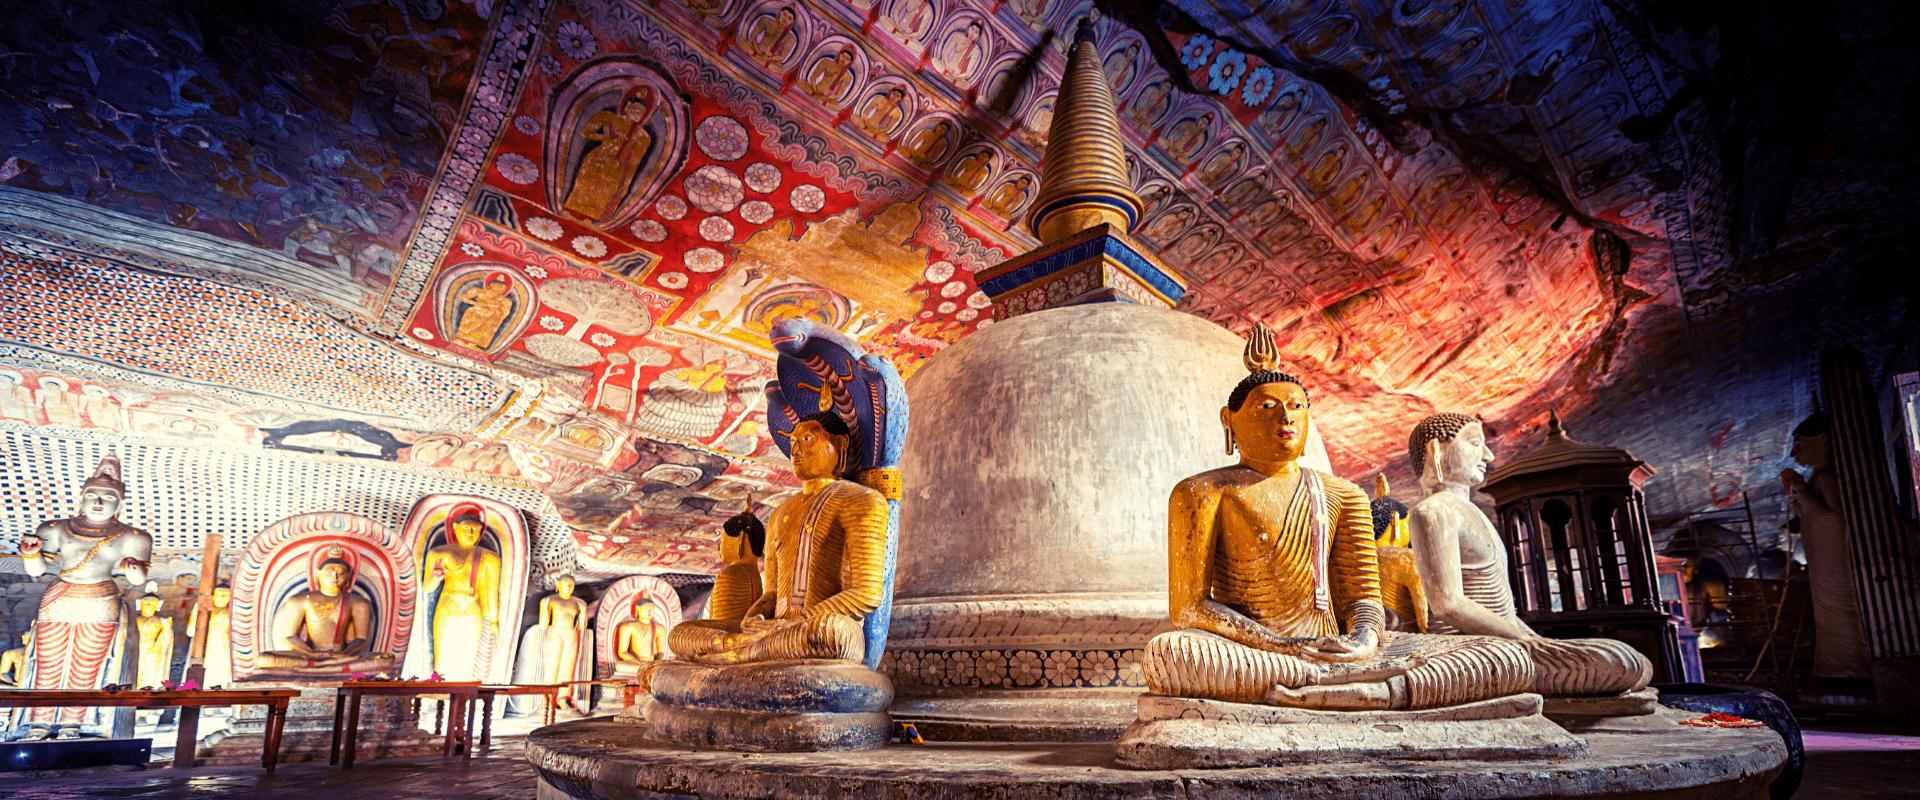 Art & Crafts Experience of Sri Lanka